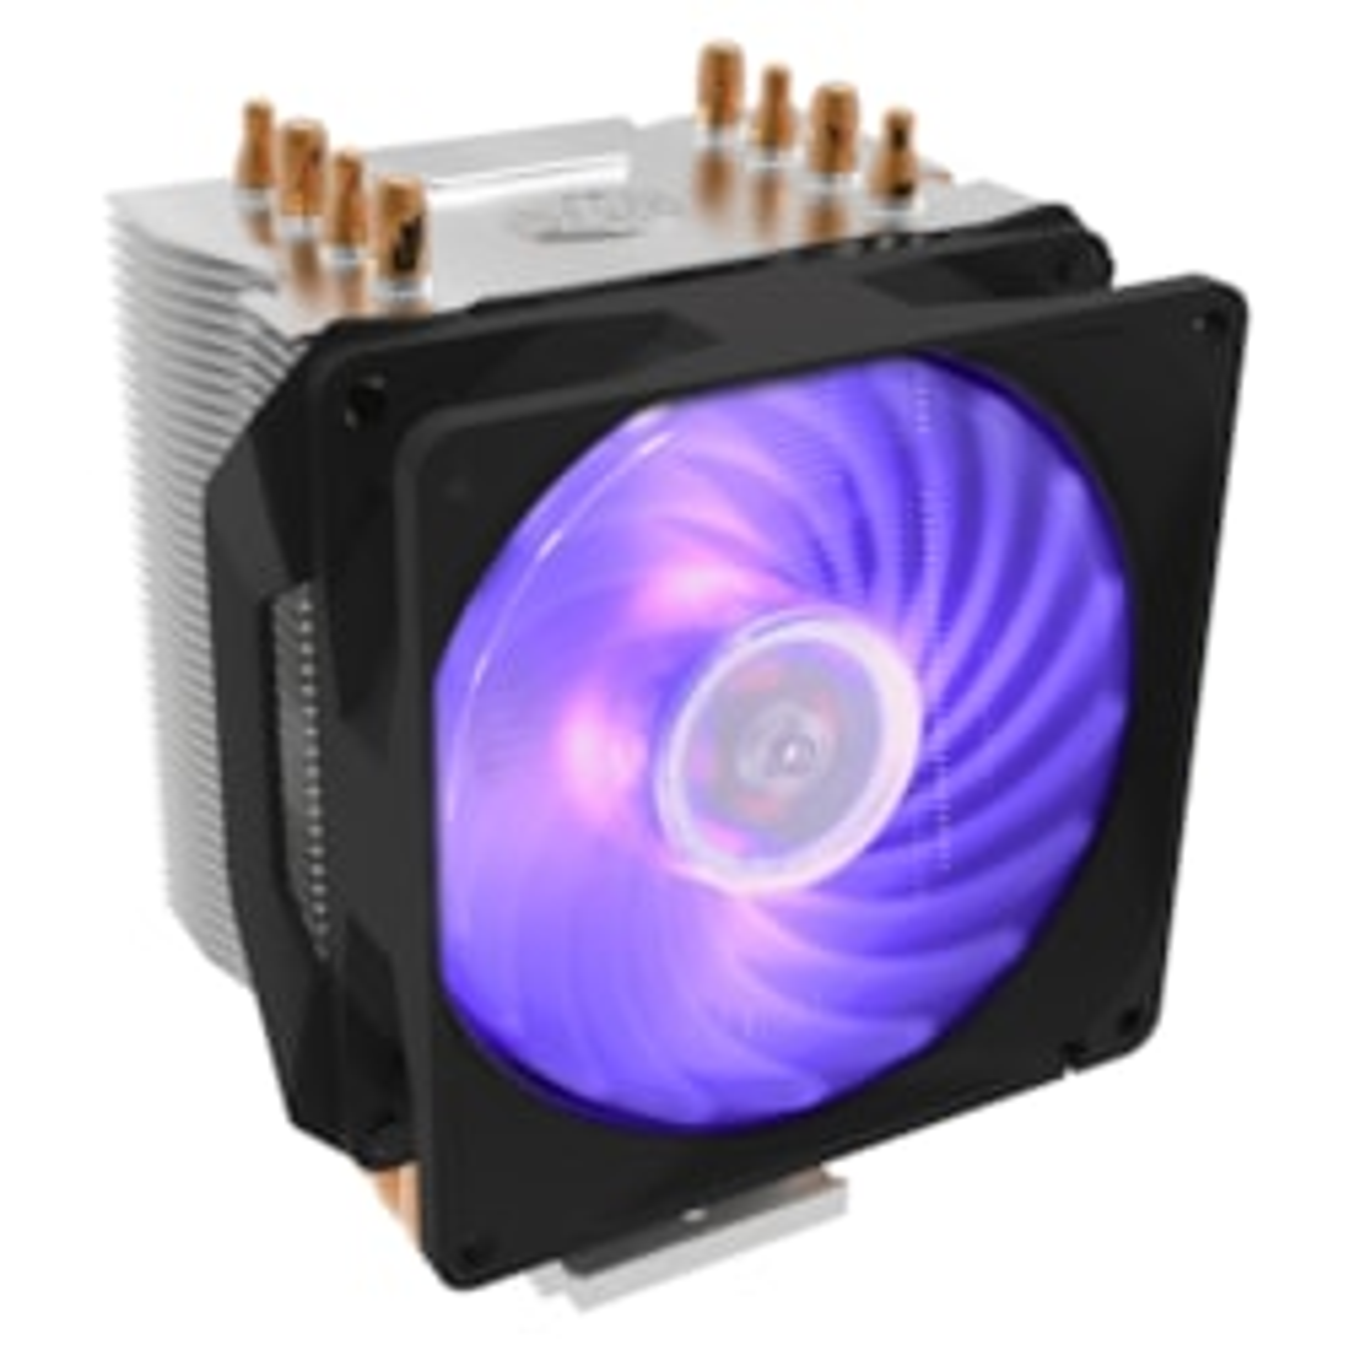 Cooler Master Hyper H410R RGB Cooling Fan/Heatsink - Processor